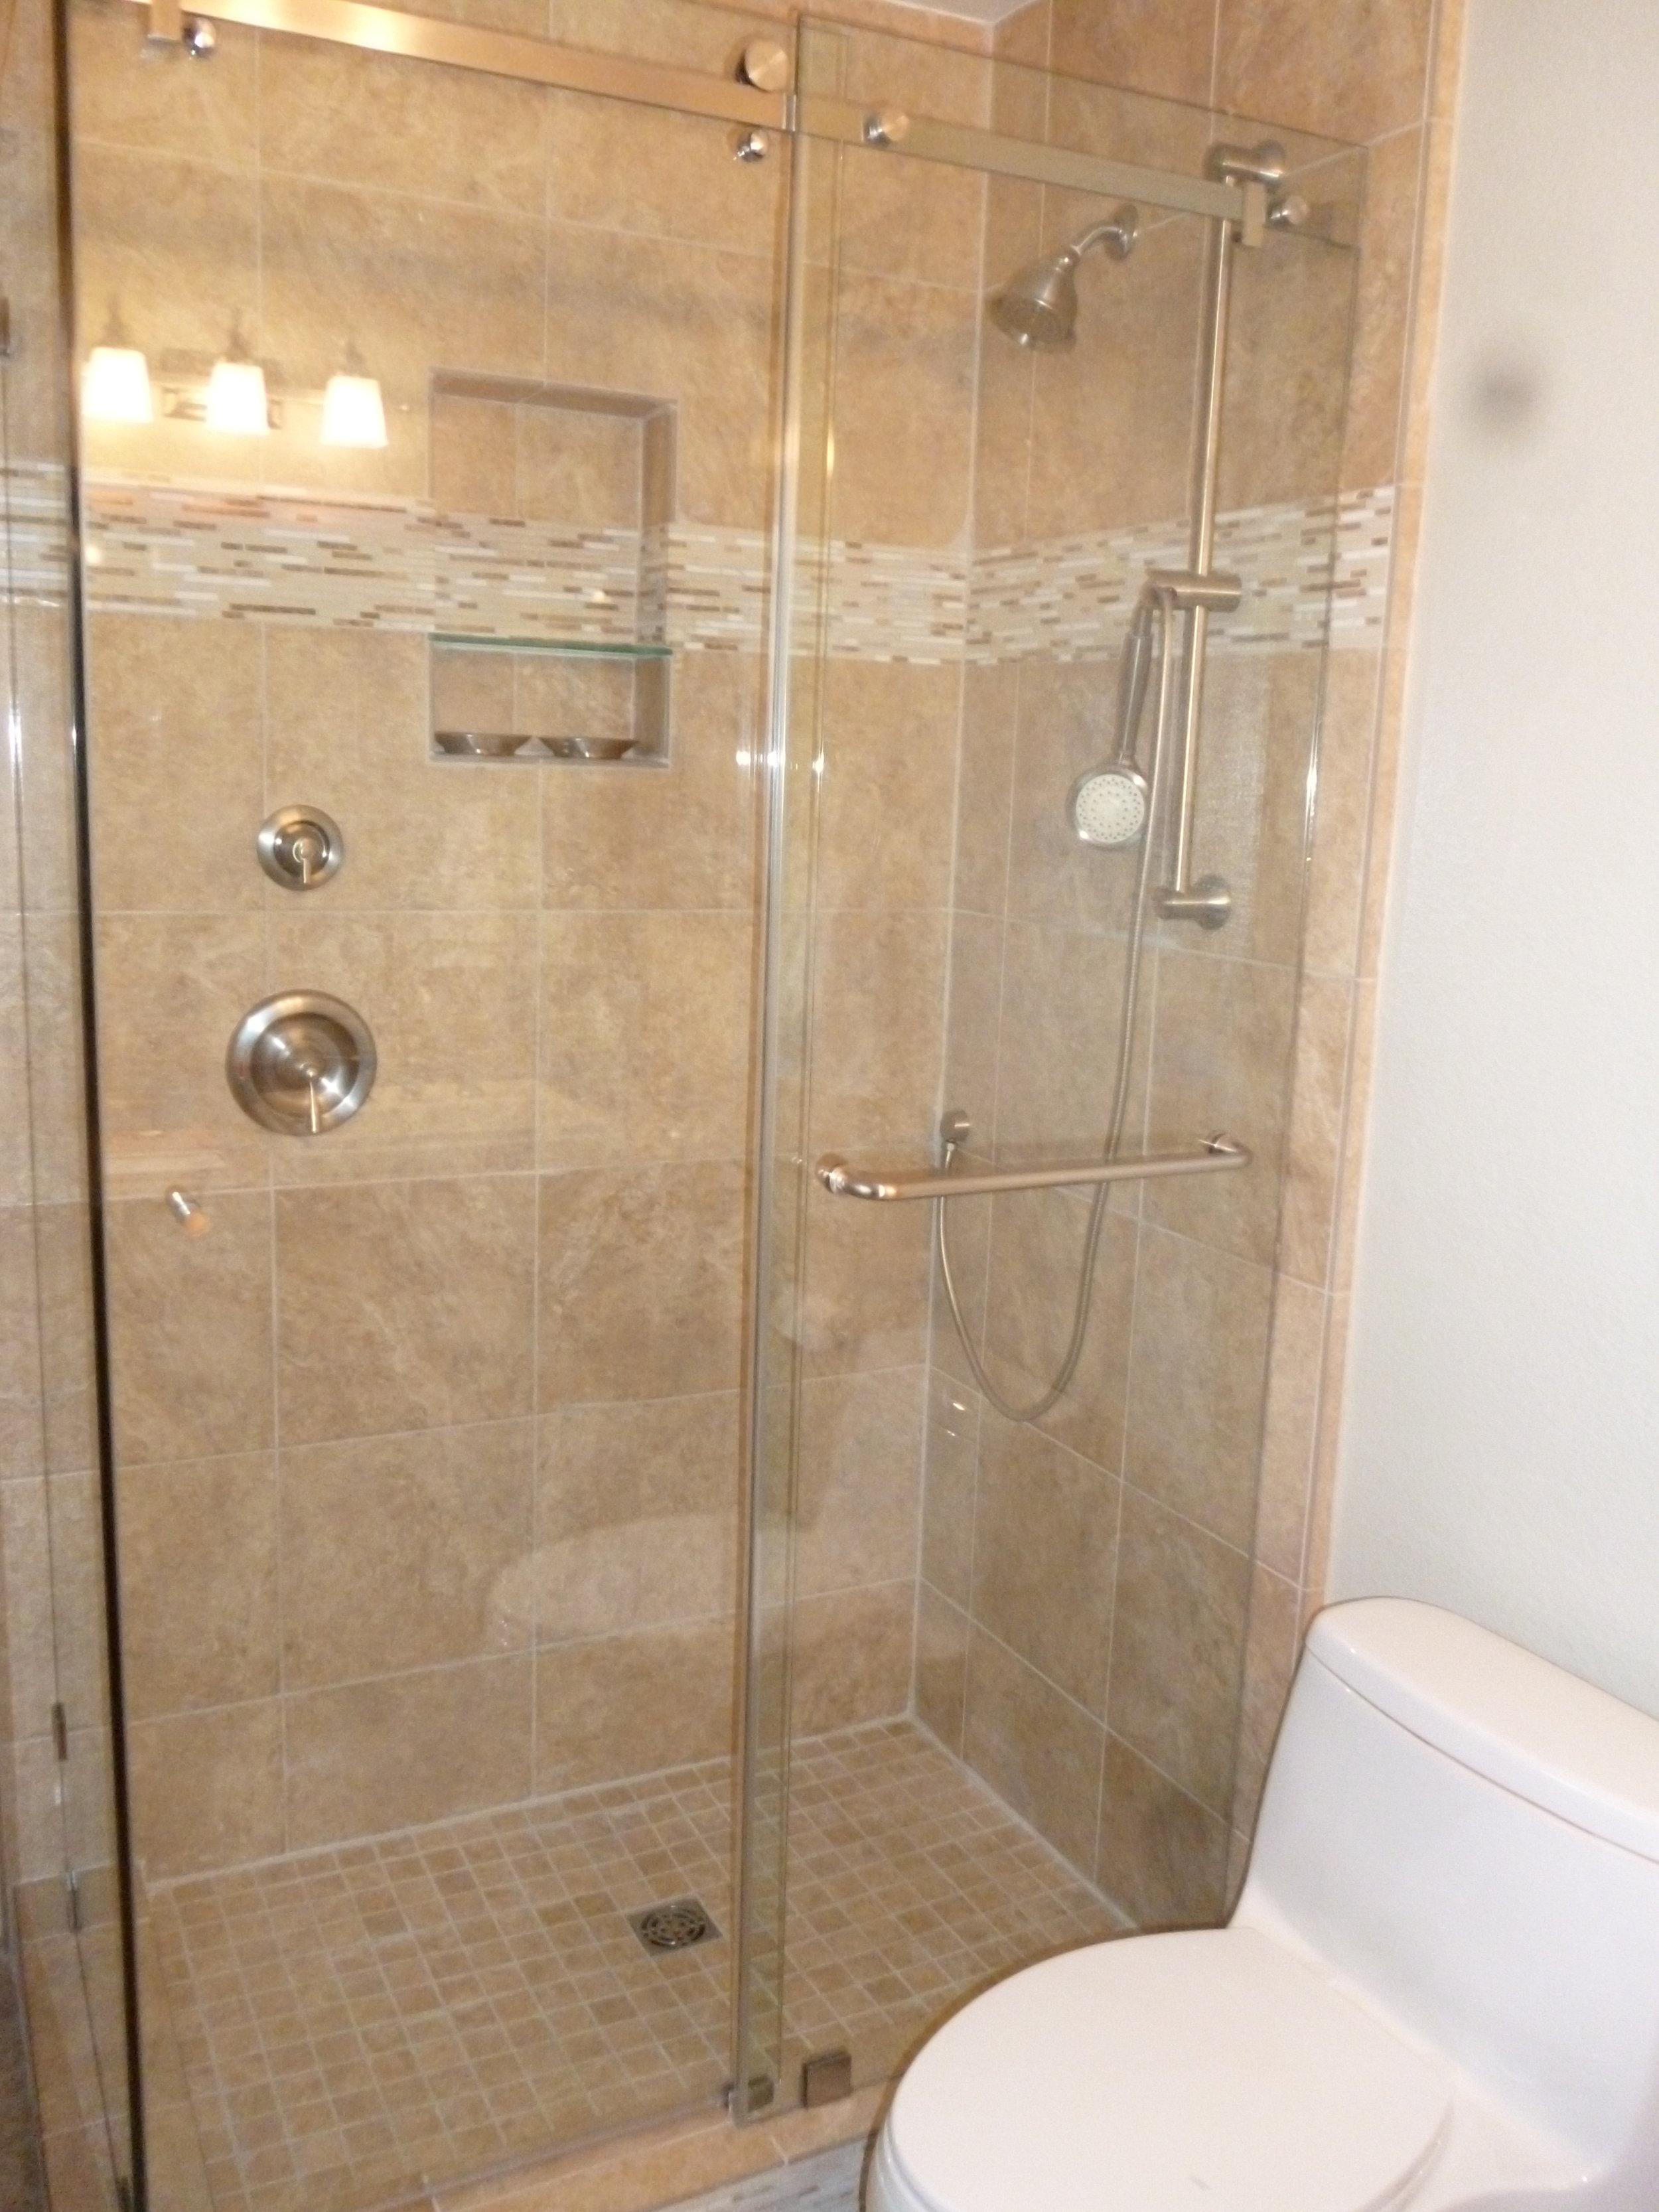 Shower-Doors-Residential-Photos-19.jpg